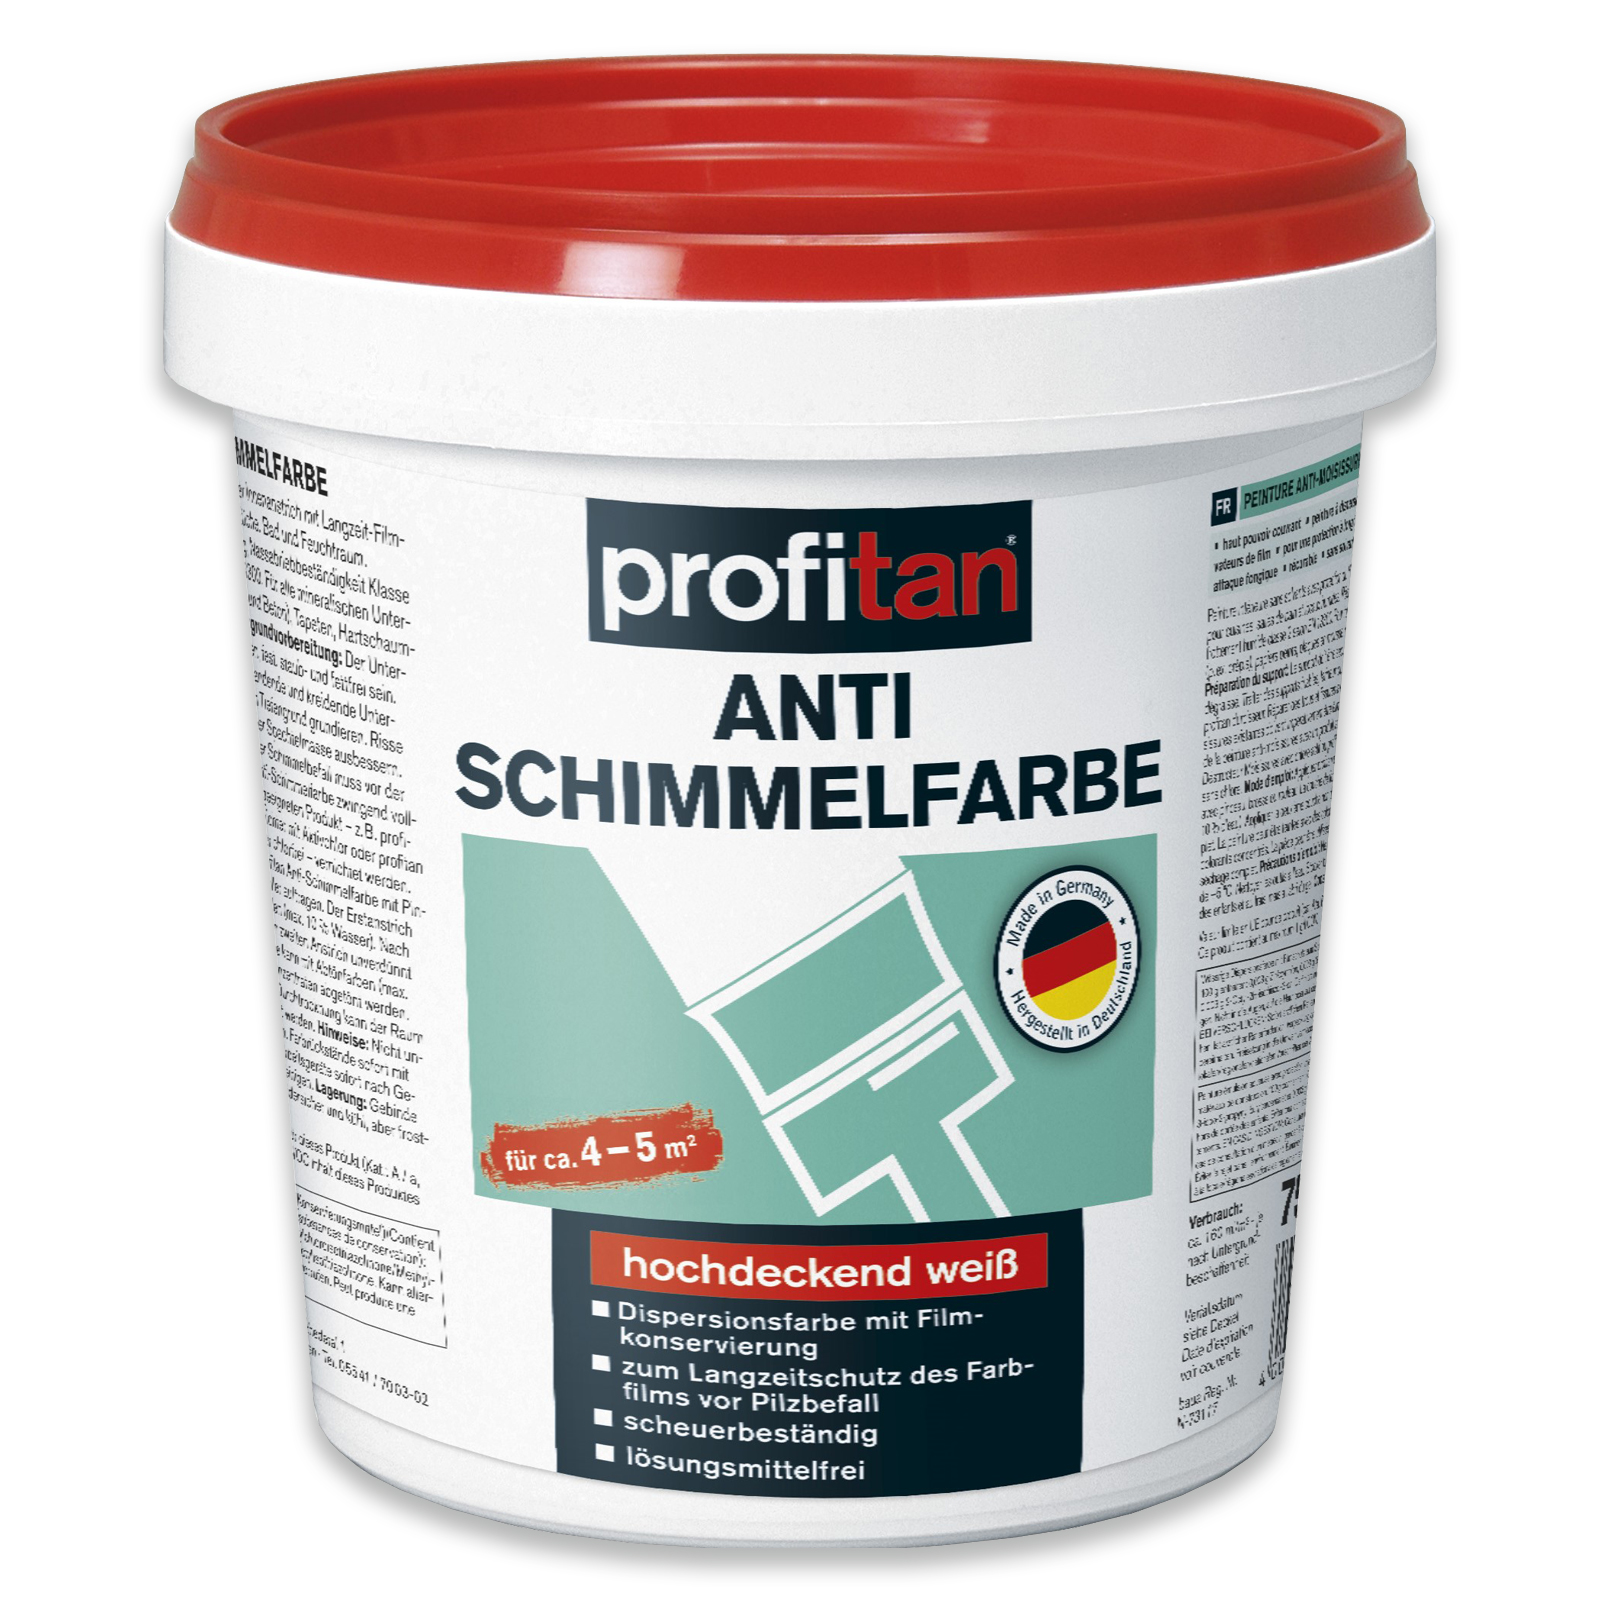 profitan Anti-Schimmelfarbe - weiß - 19 ml